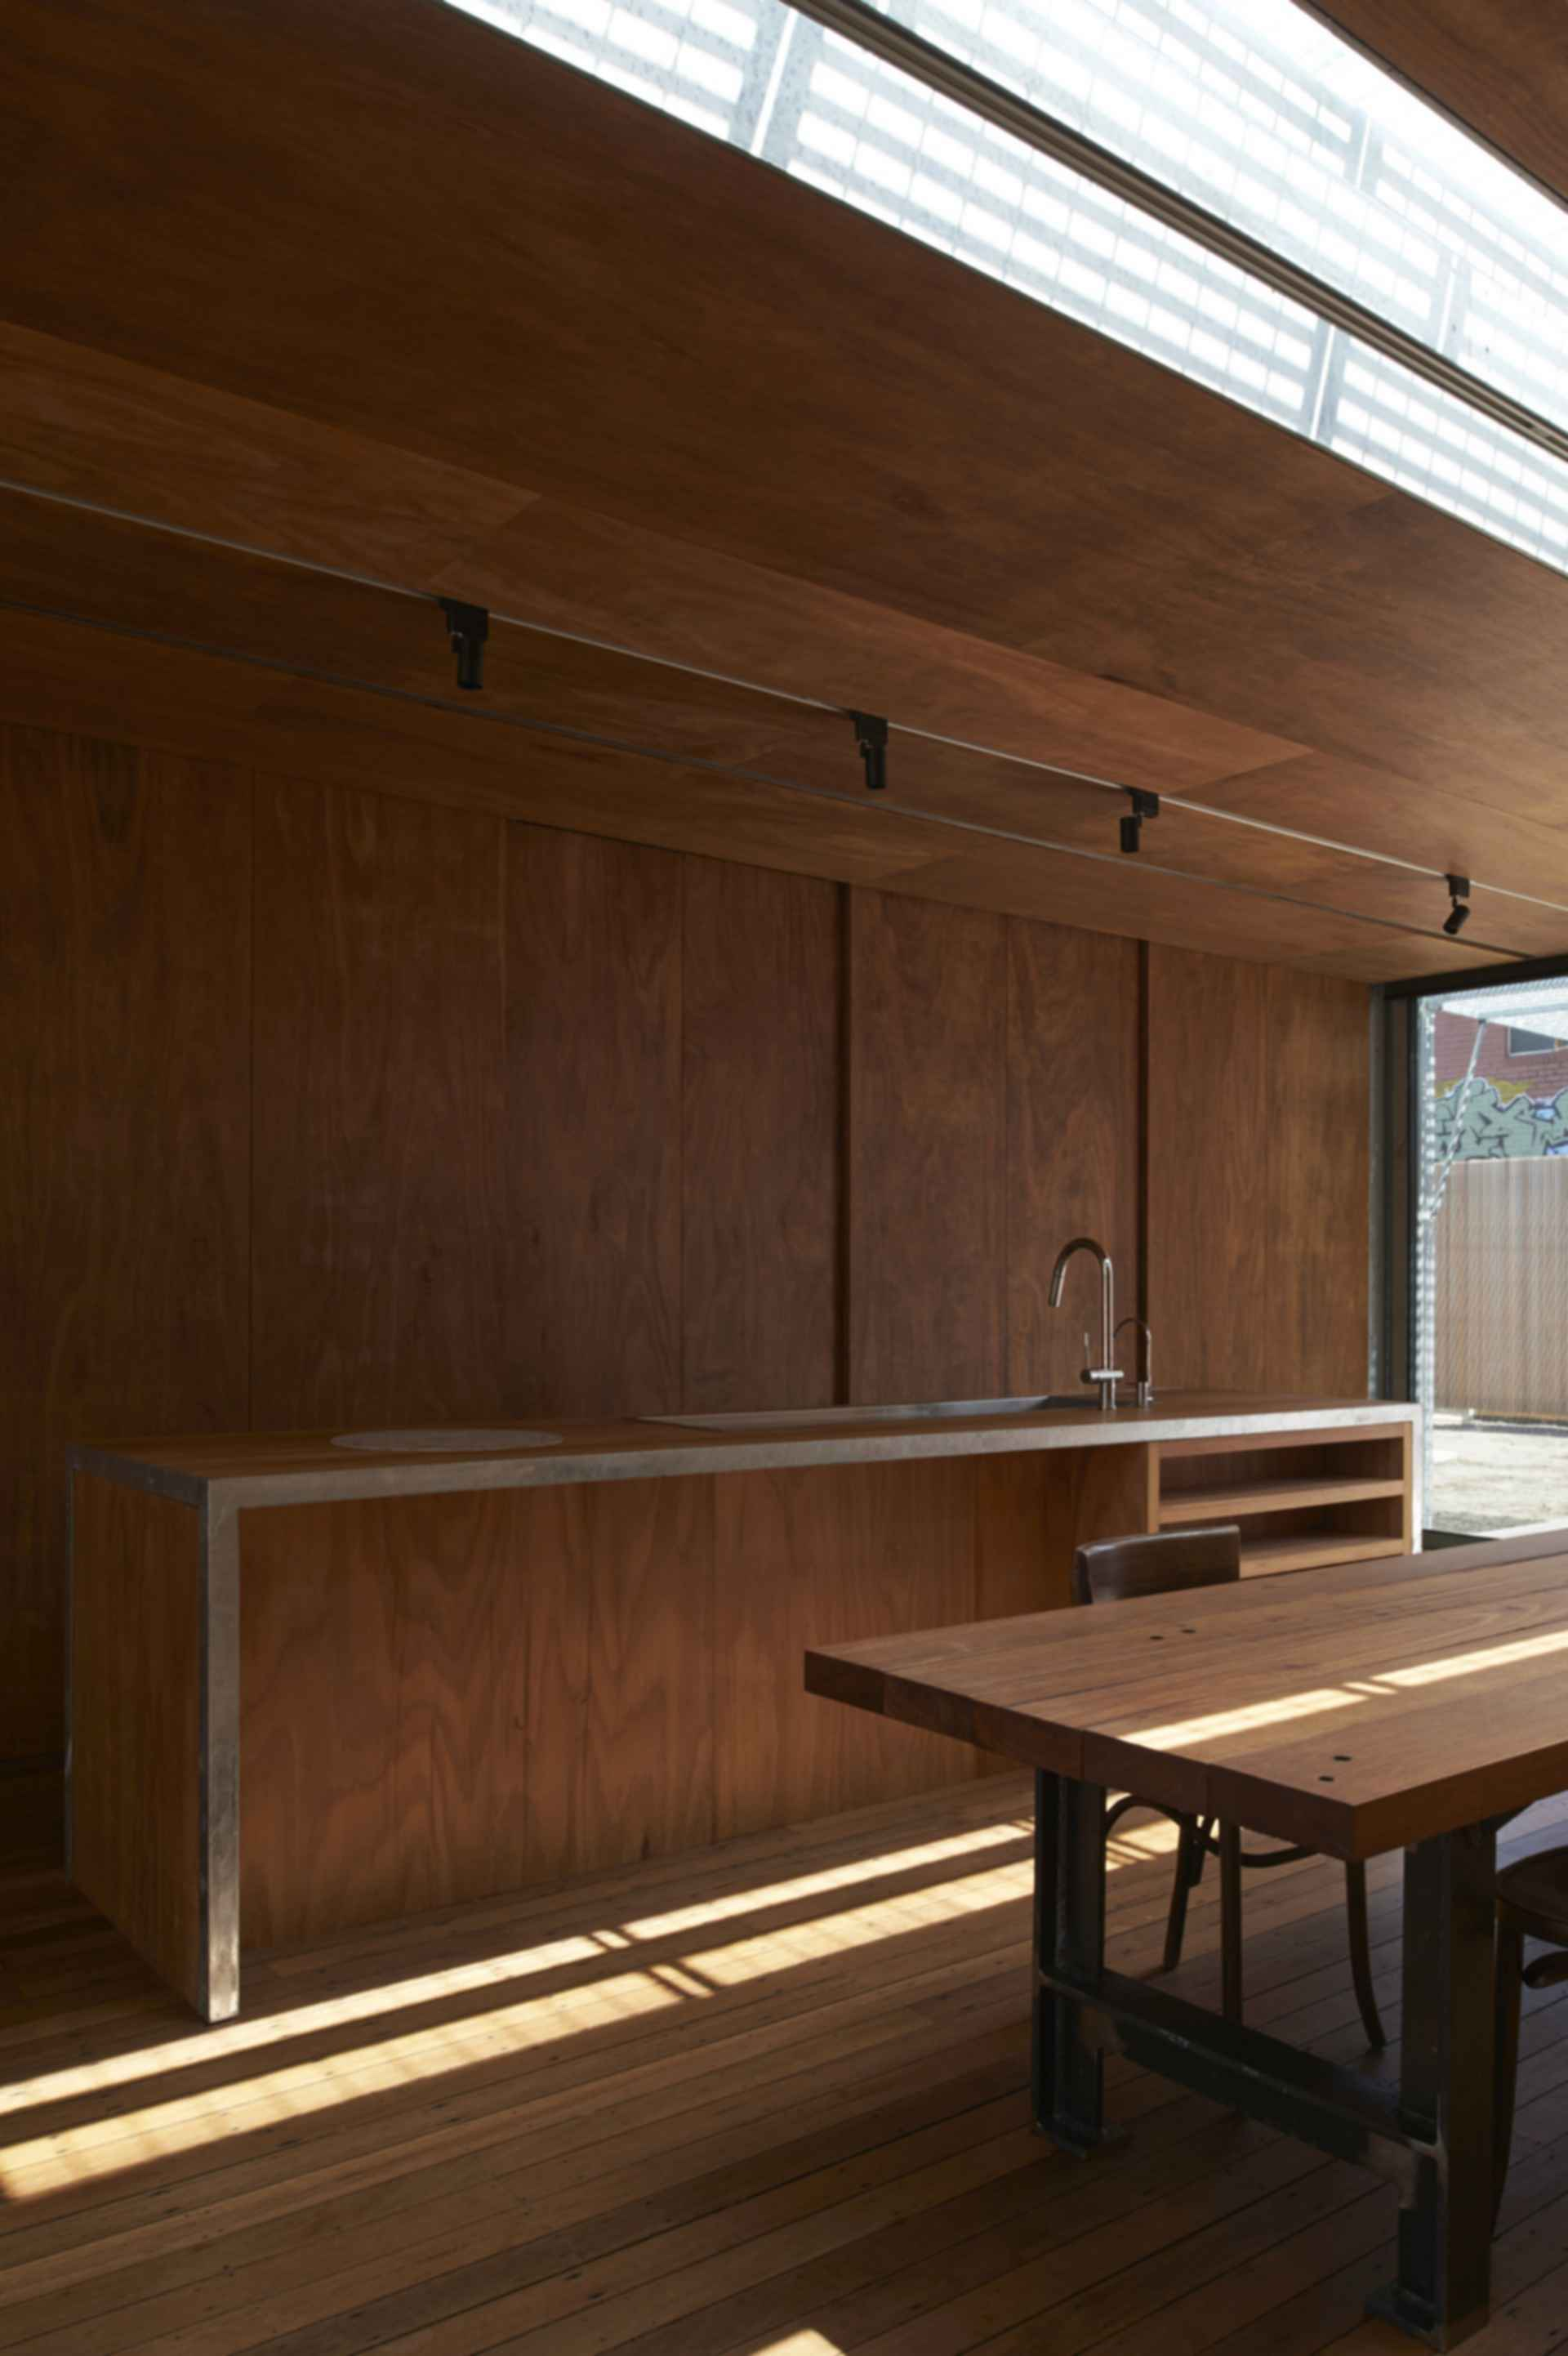 The Edward Street House - Interior/Kitchen